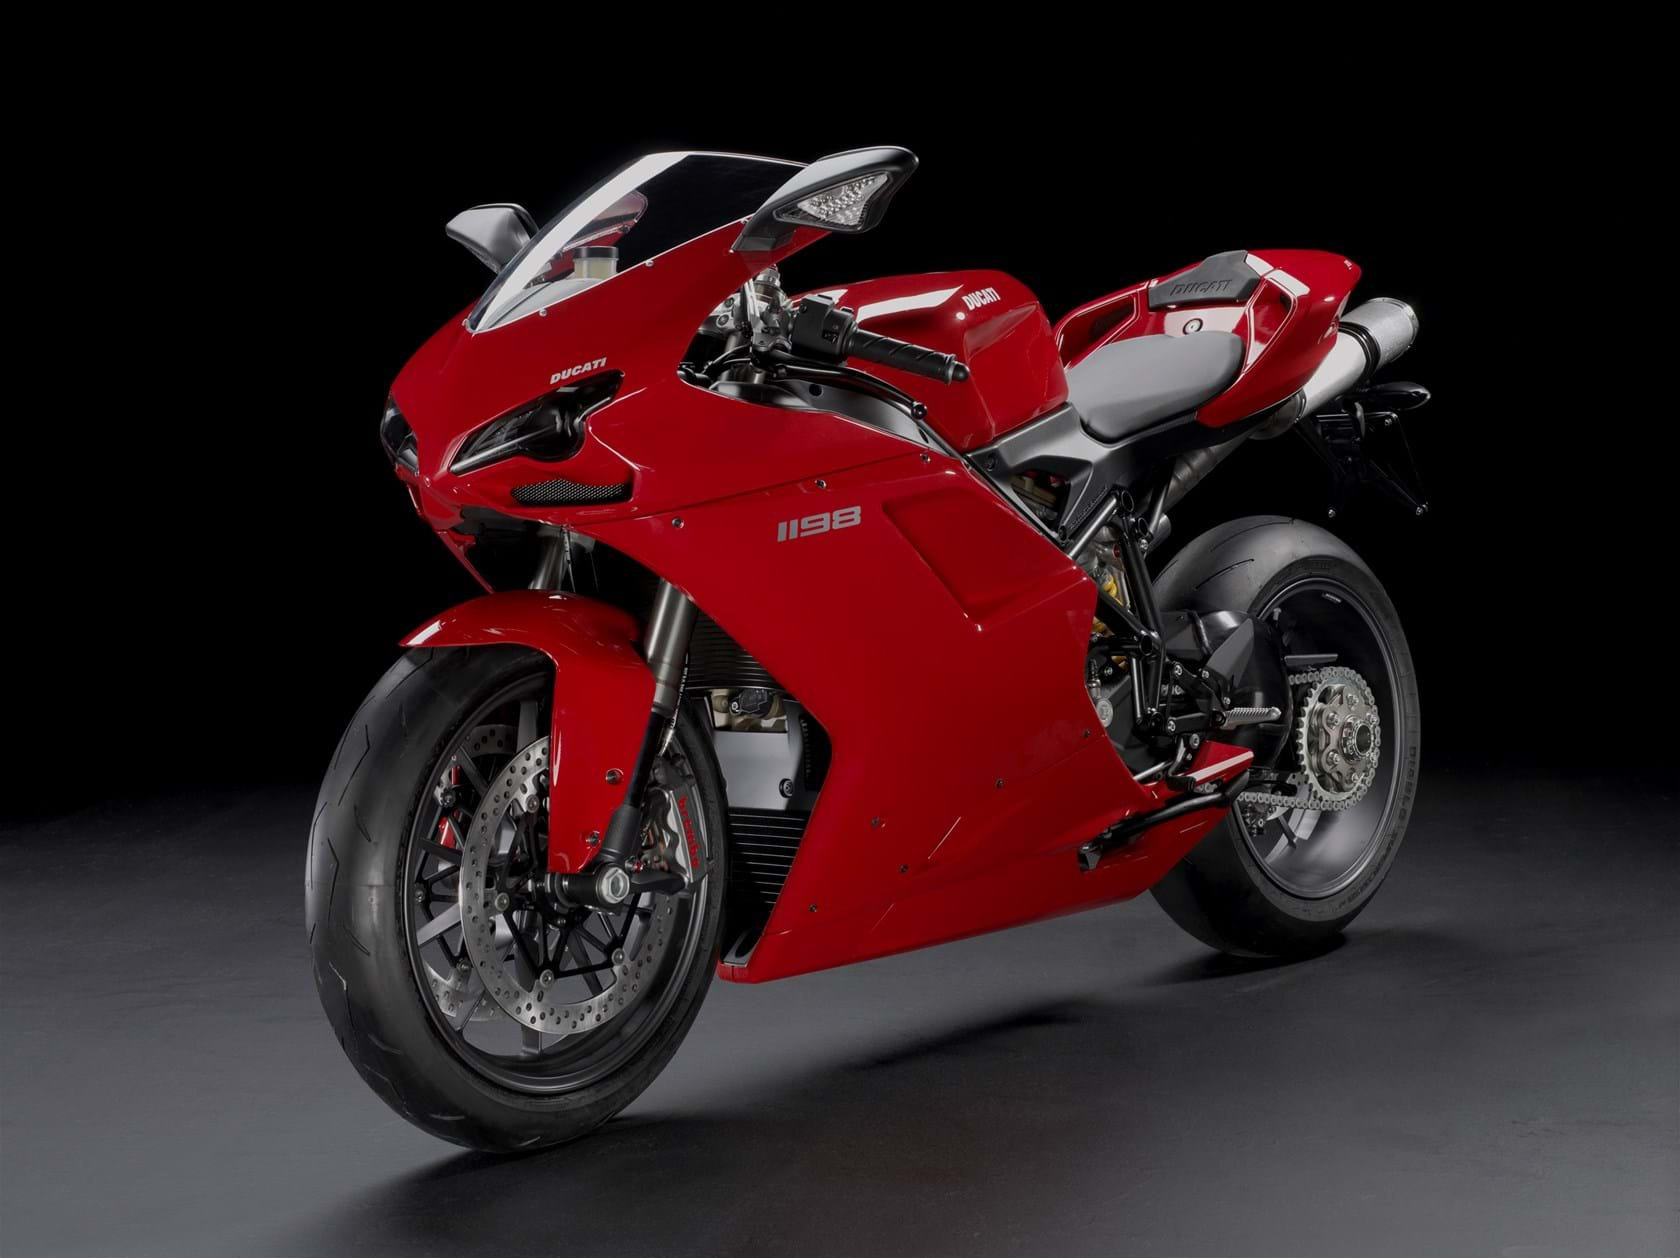 Ducati 1198 For Sale